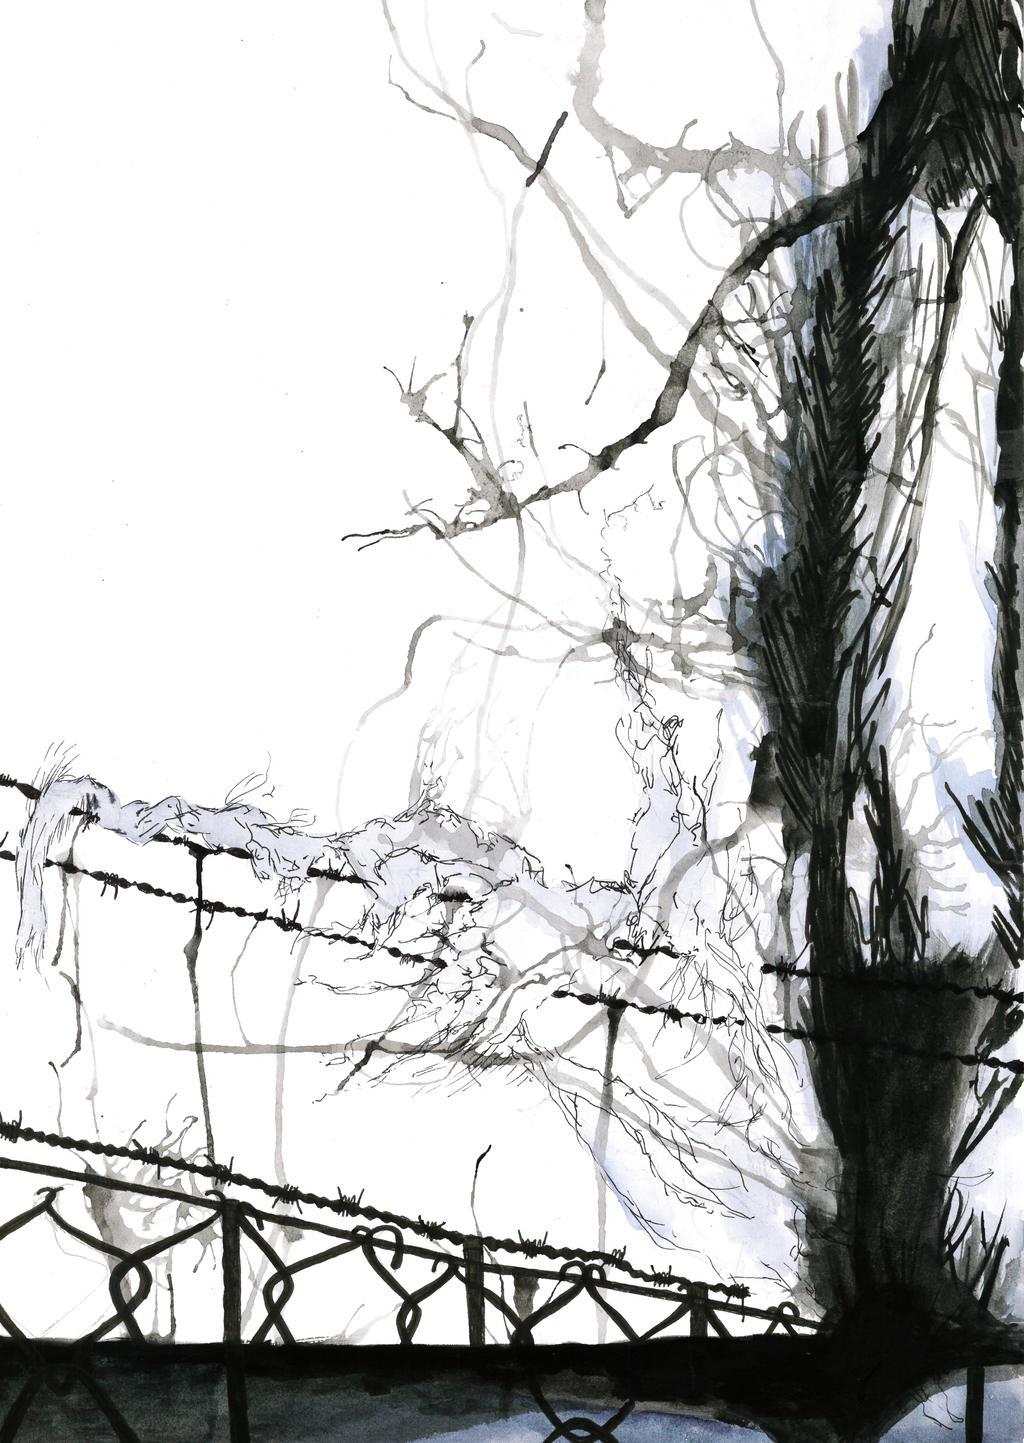 Shredded by MetalOxide-Creations